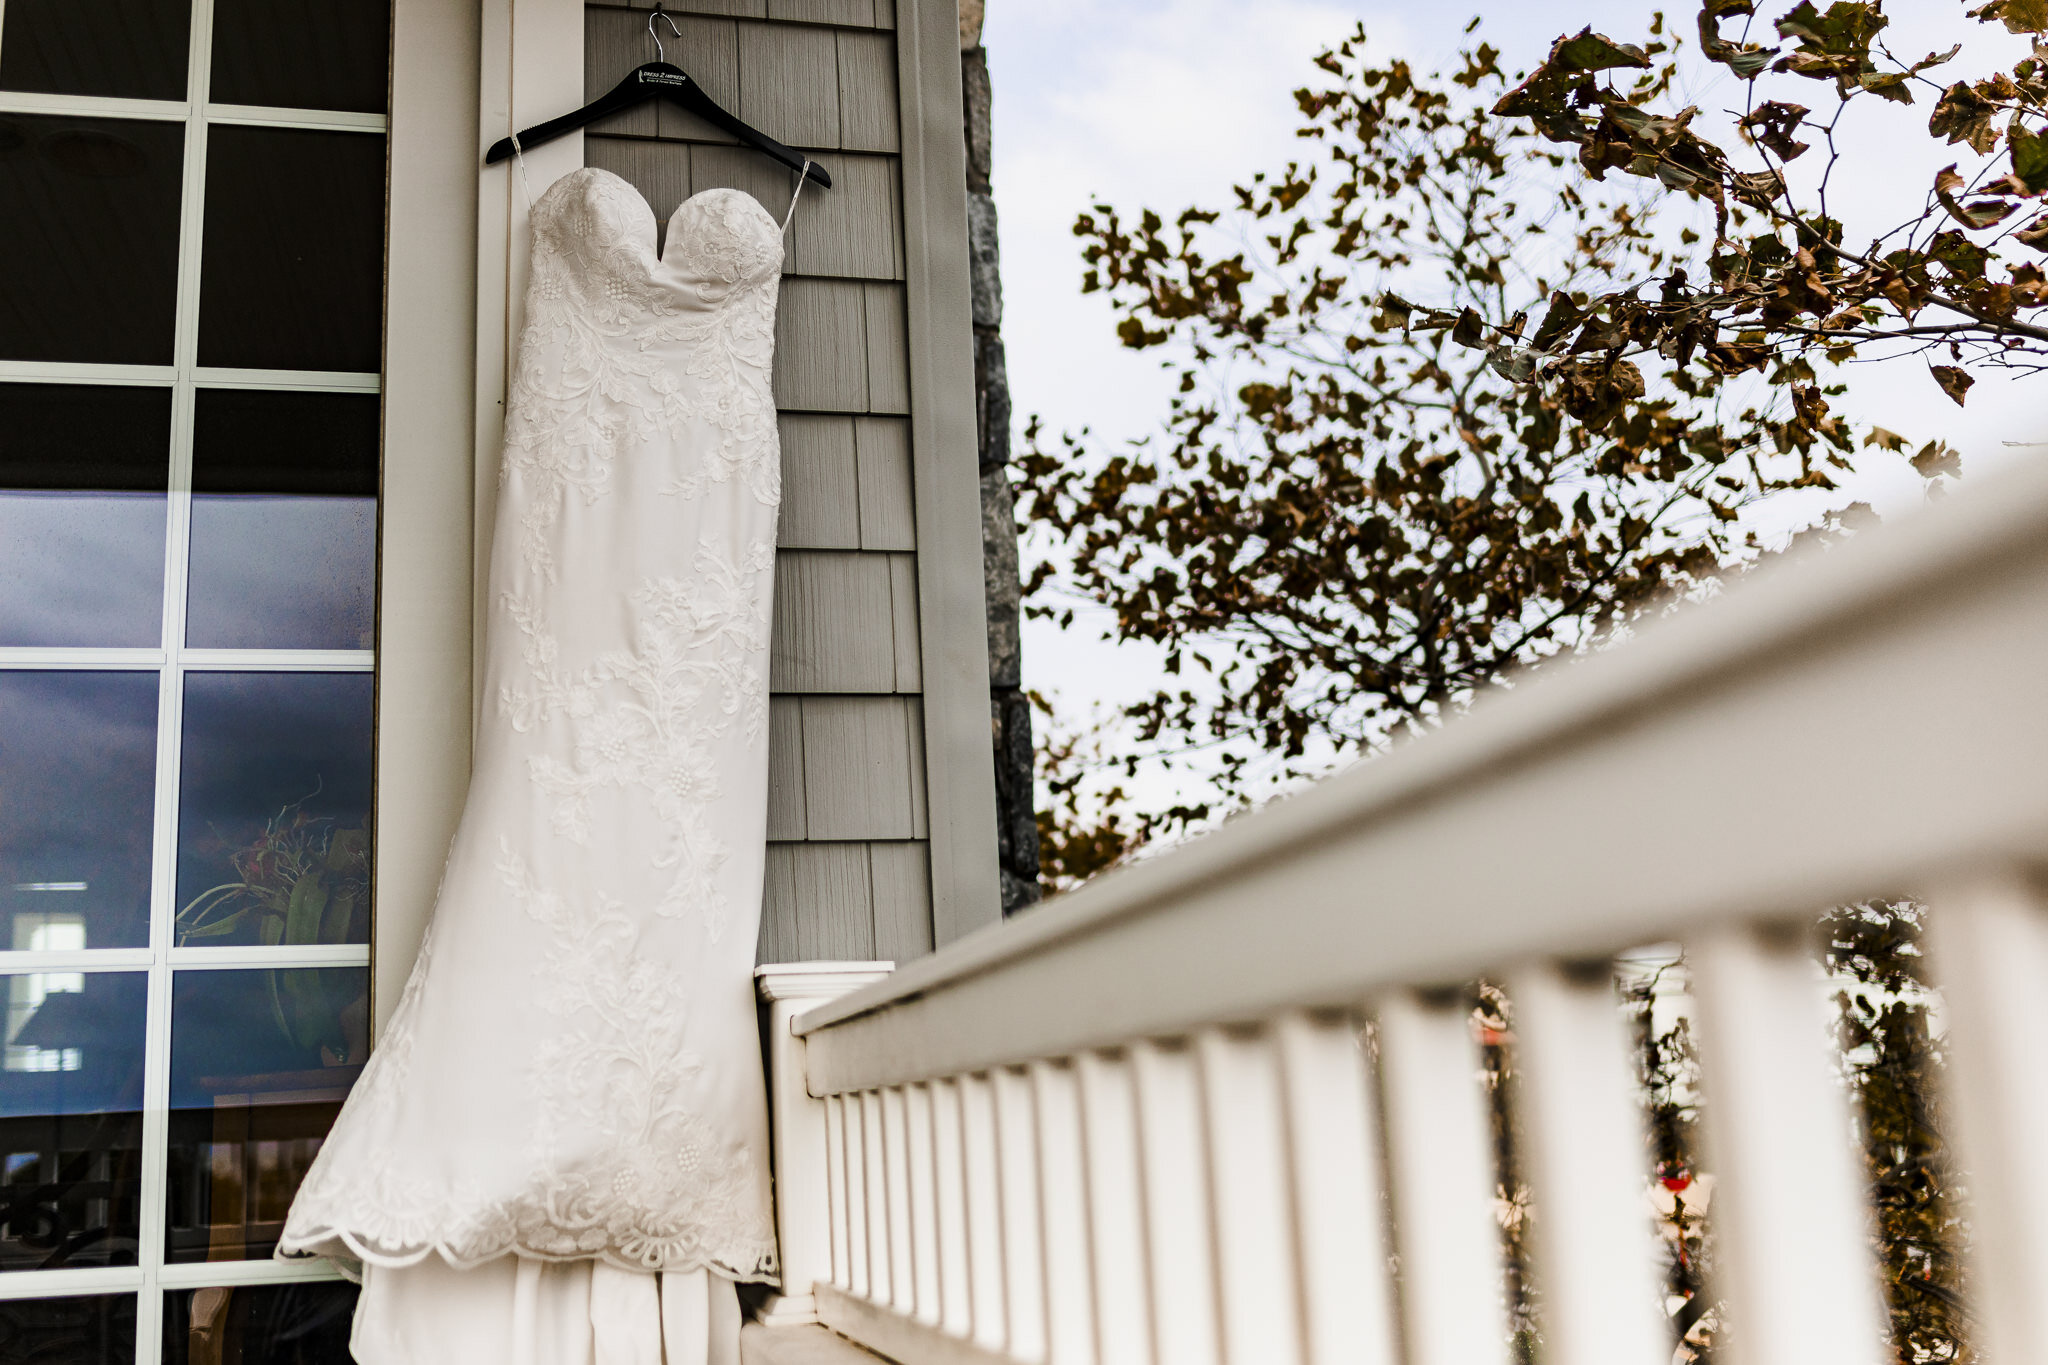 Snell-Ocean-City-Yacht-Club-New-Jersey-Wedding-Photographer-02.JPG